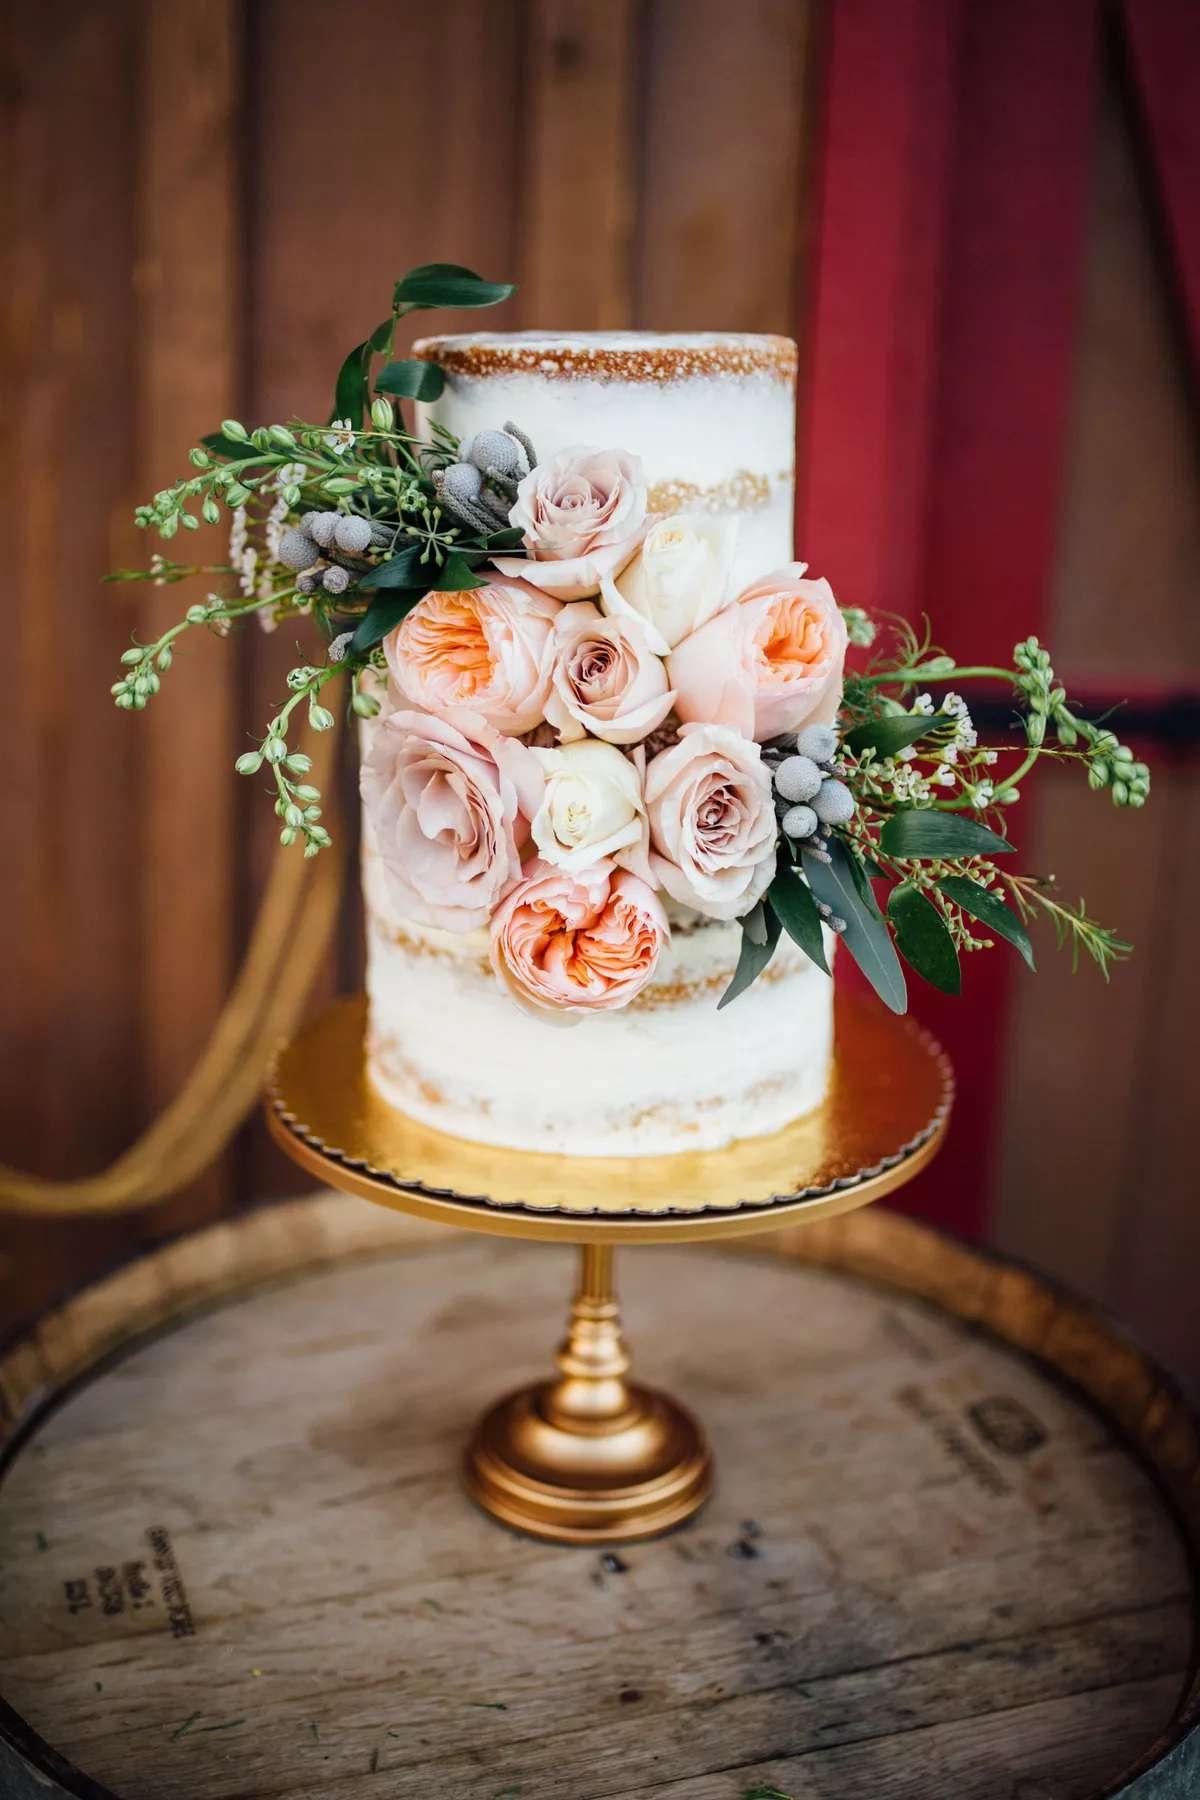 cake on display on a wine barrel